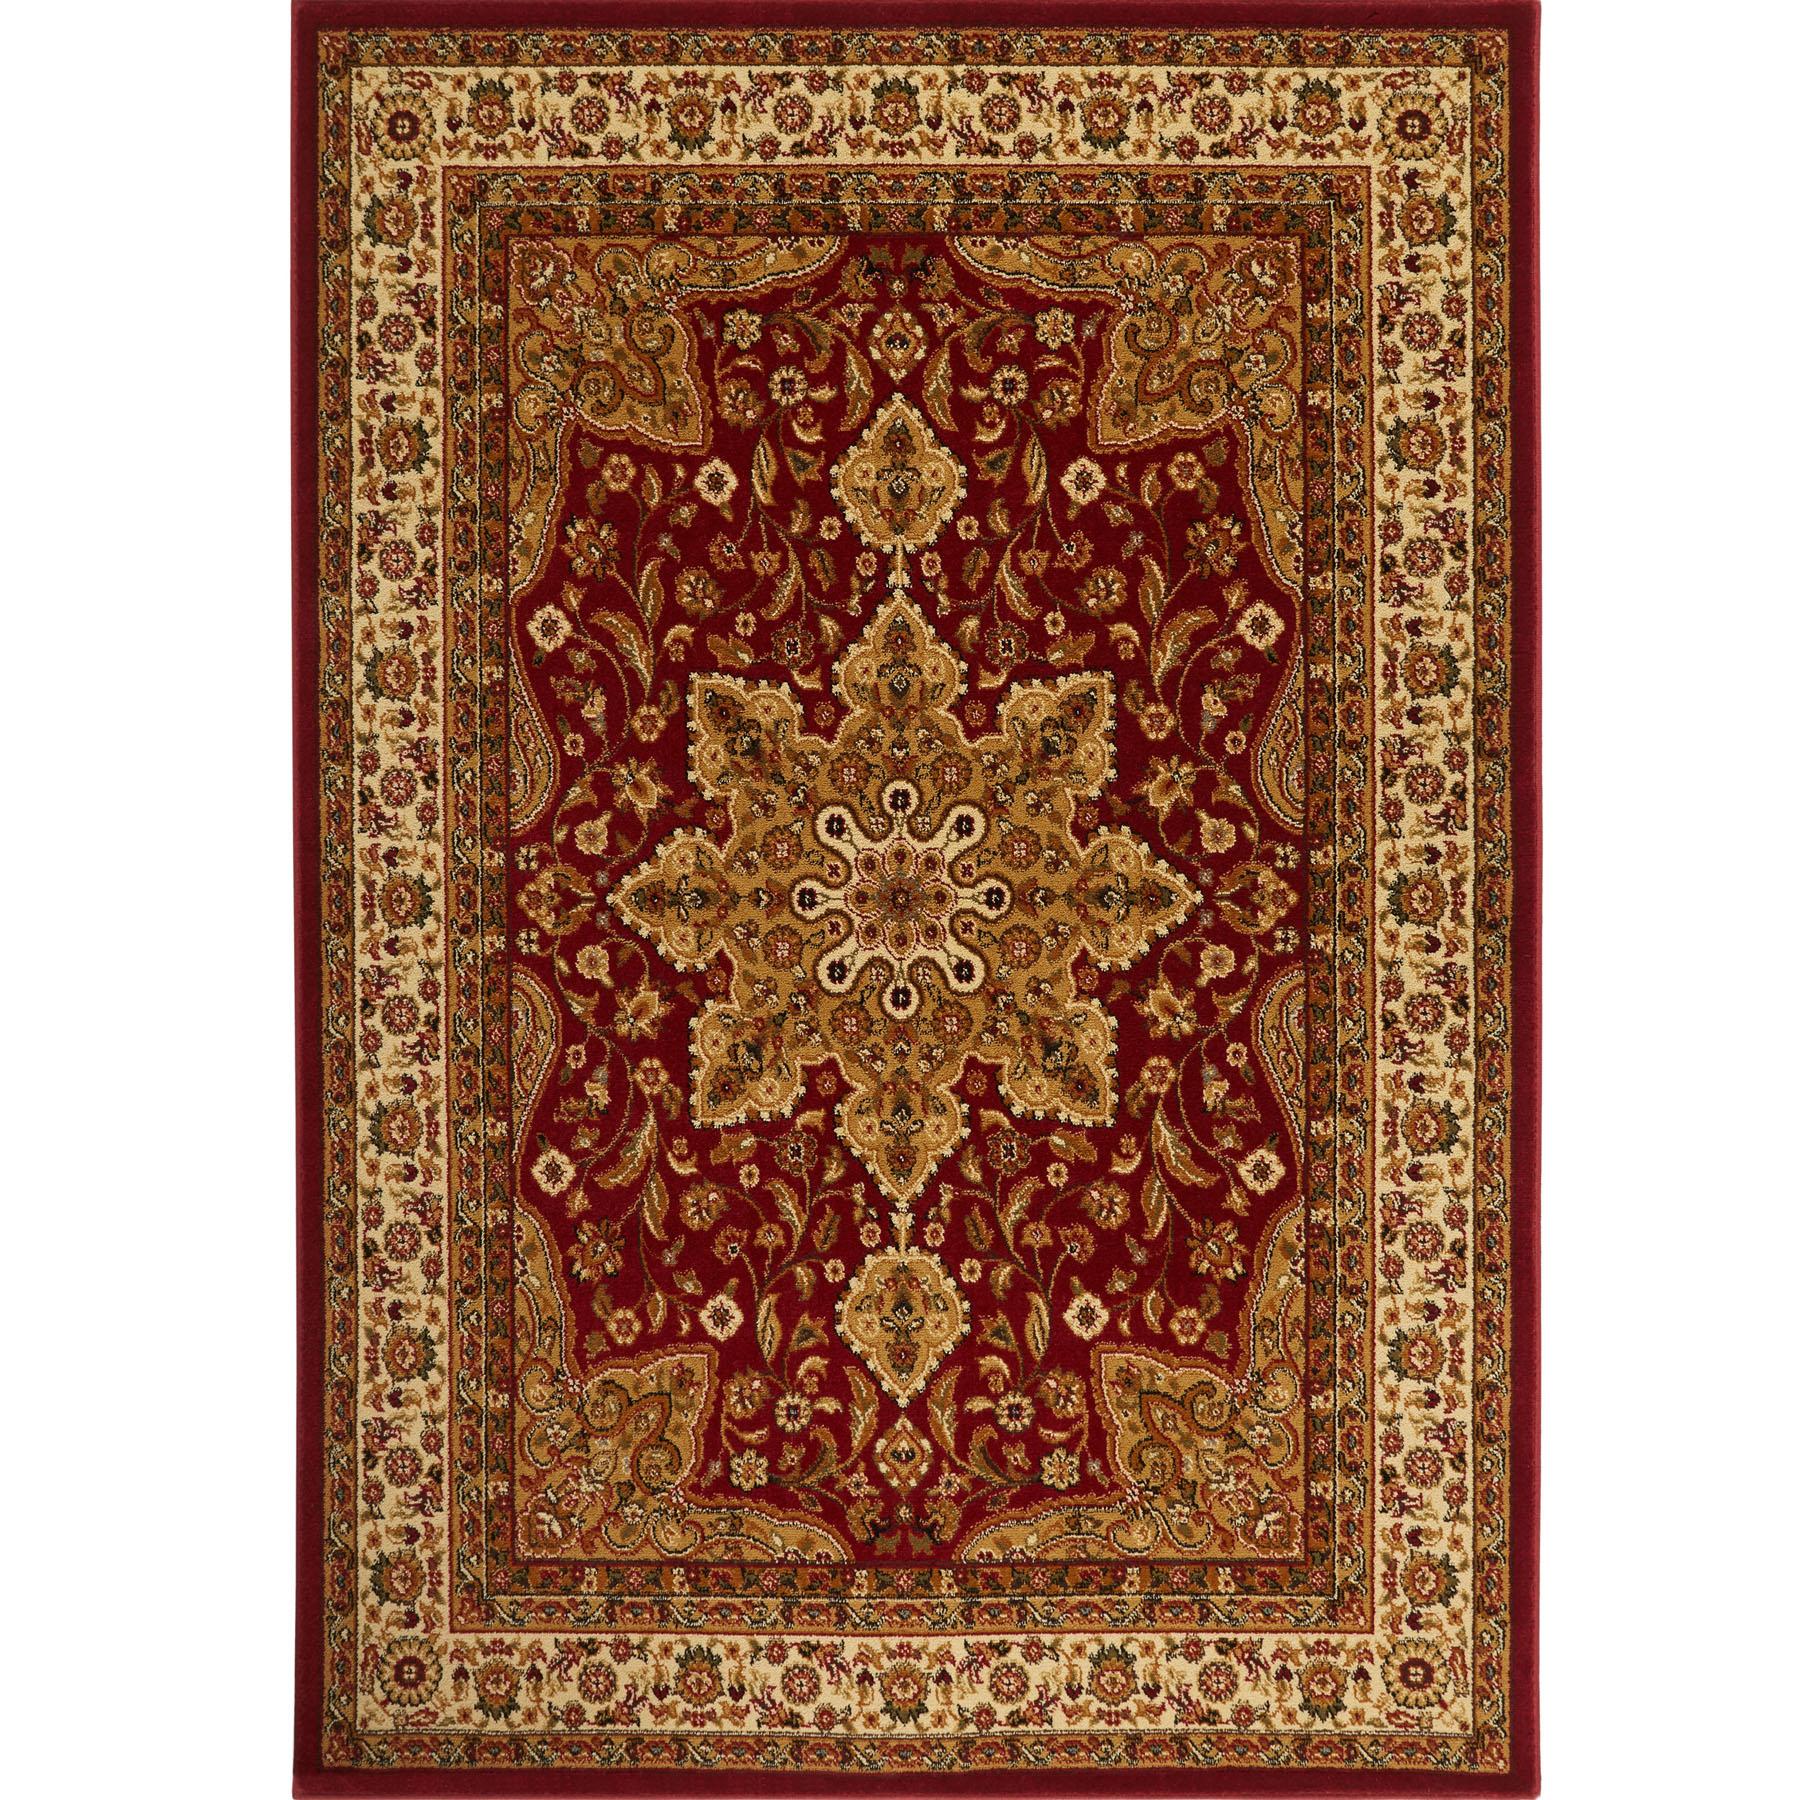 7 X 11 Area Rug: Large Medallion 8 X 11 Persian Area Rug Border Carpet